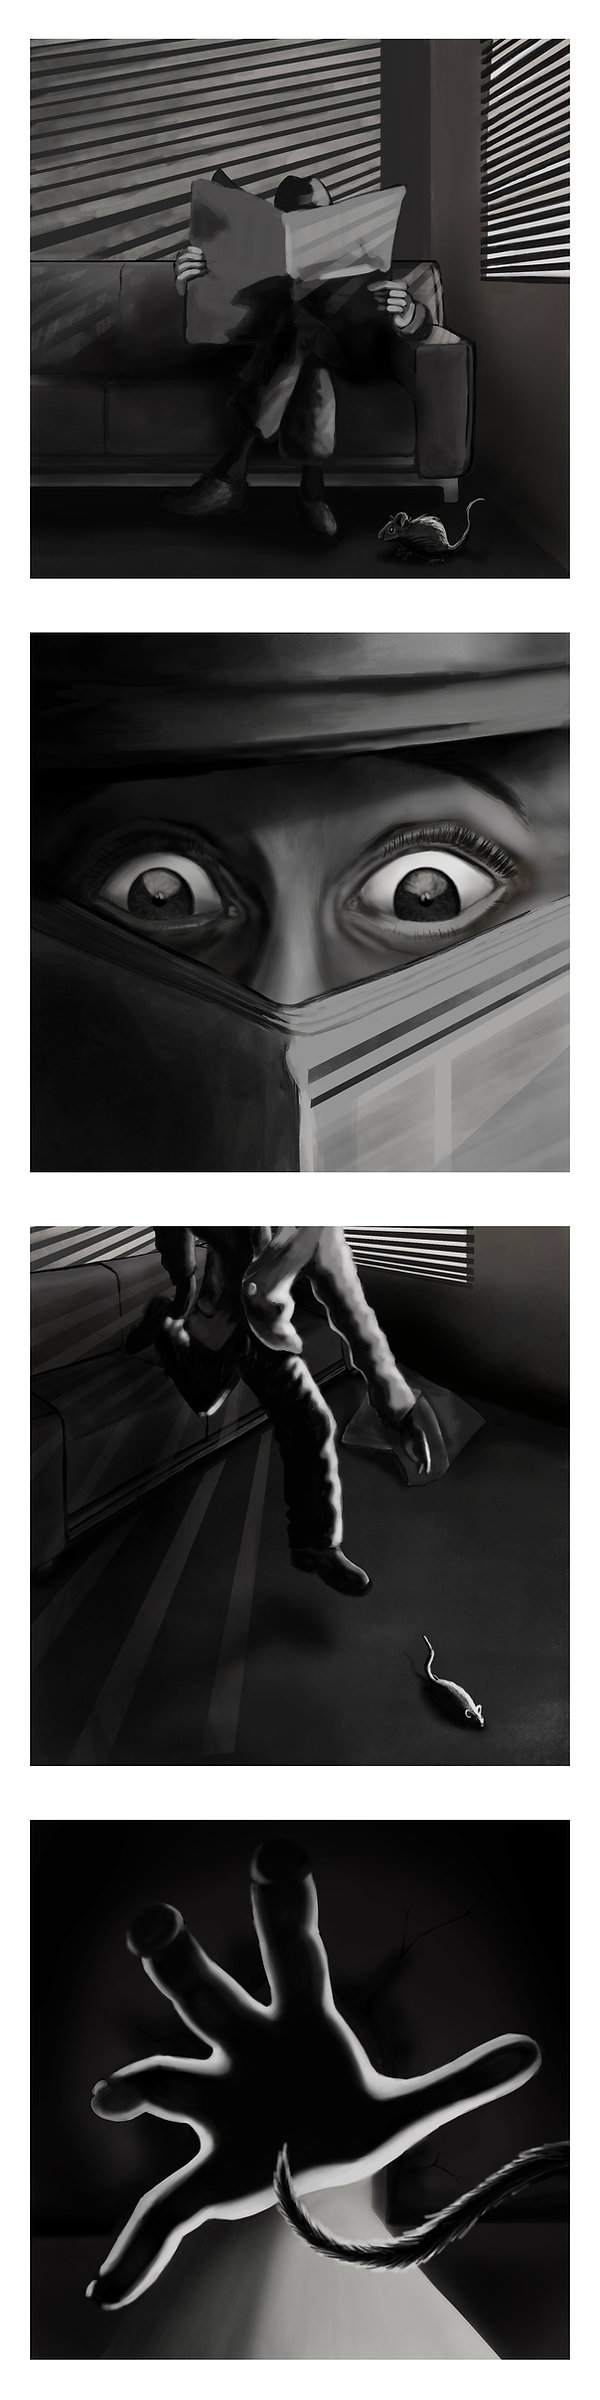 noir vertical2.jpg